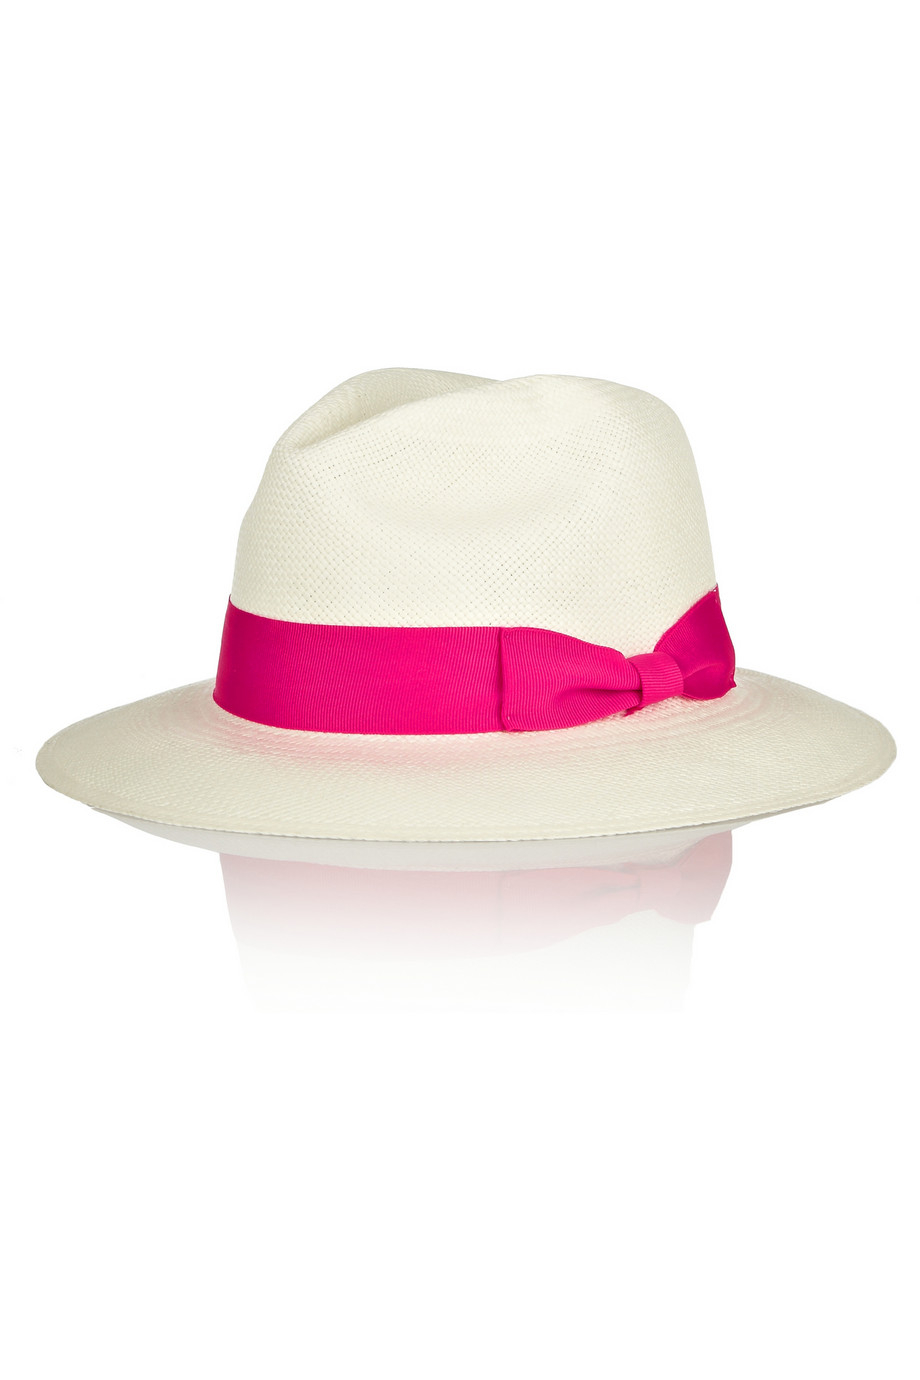 Classic Toquilla Straw Panama Hat - White Sensi Studio FKFyn